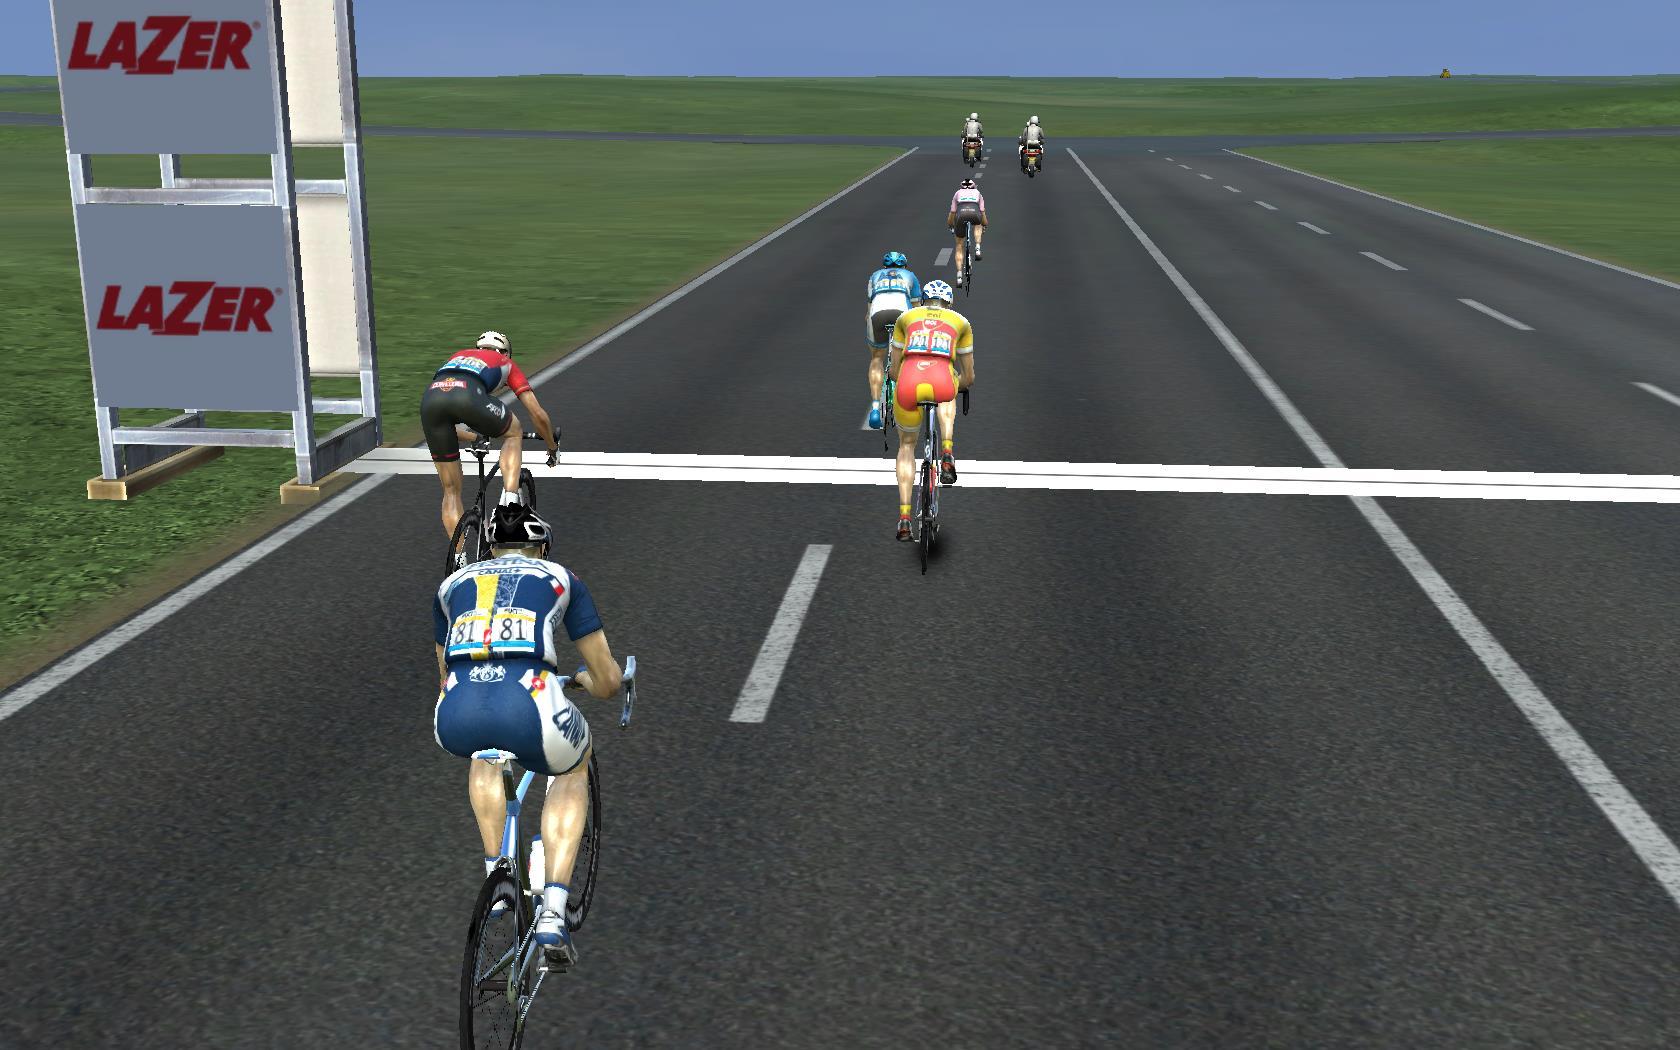 pcmdaily.com/images/mg/2018/Races/C2/USAPCC/1/PCM0016.jpg